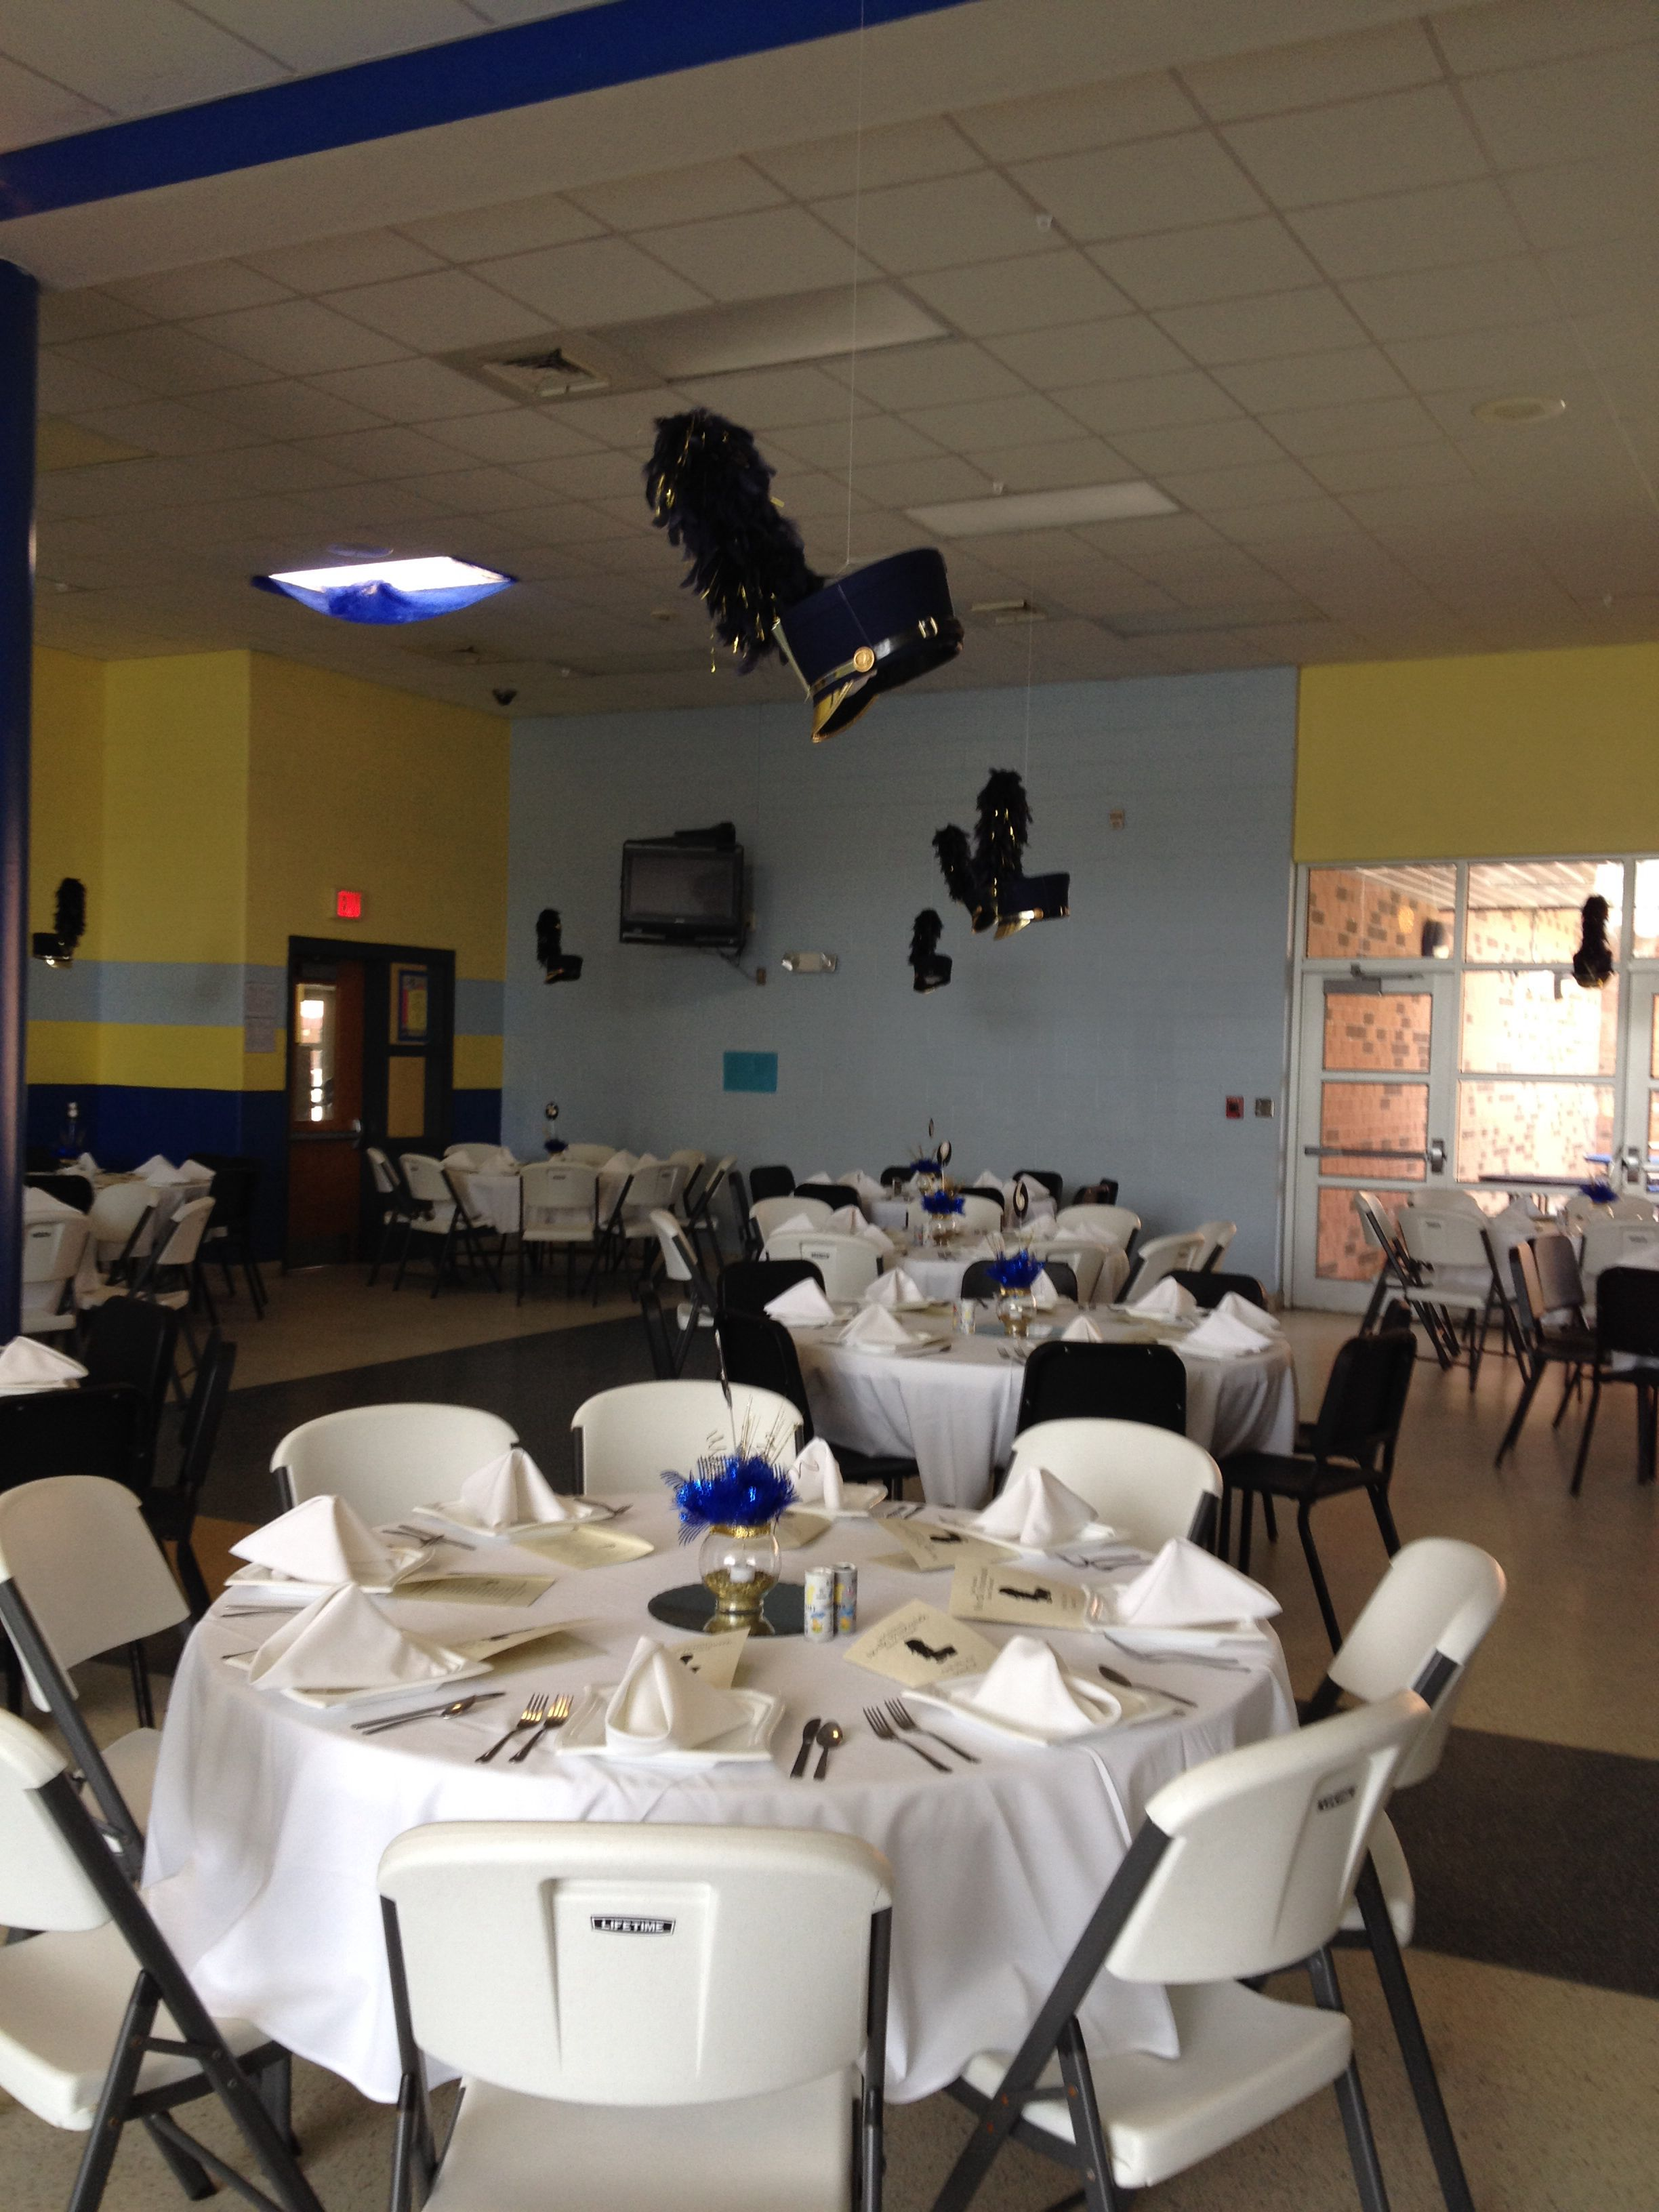 Band banquet idead party decorations pinterest